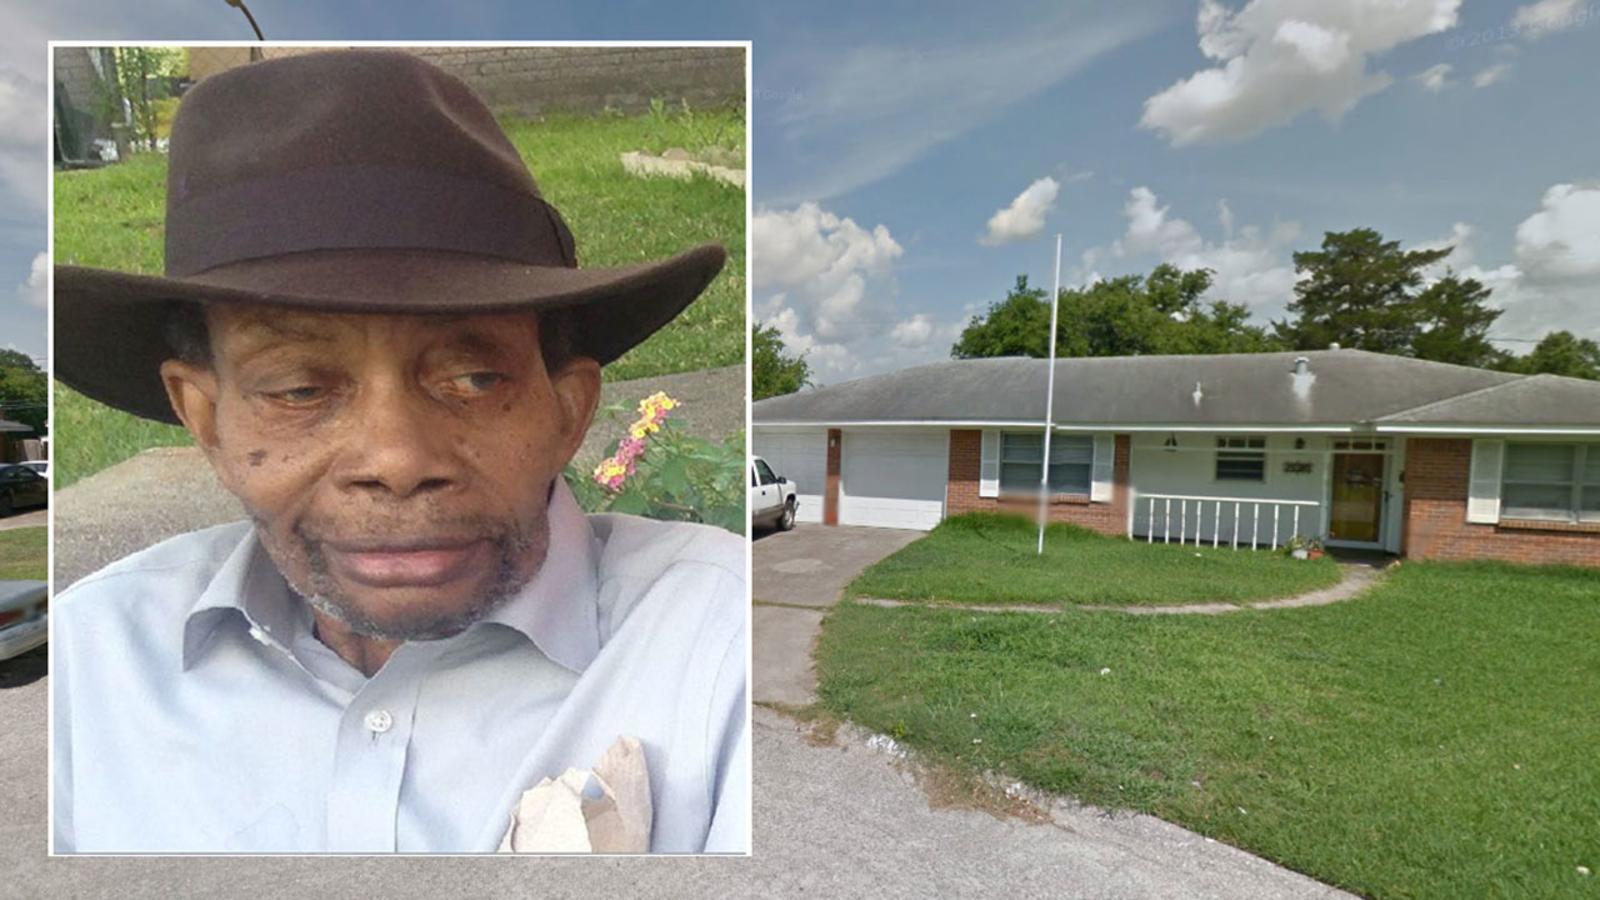 86-year-old man missing in Baytown